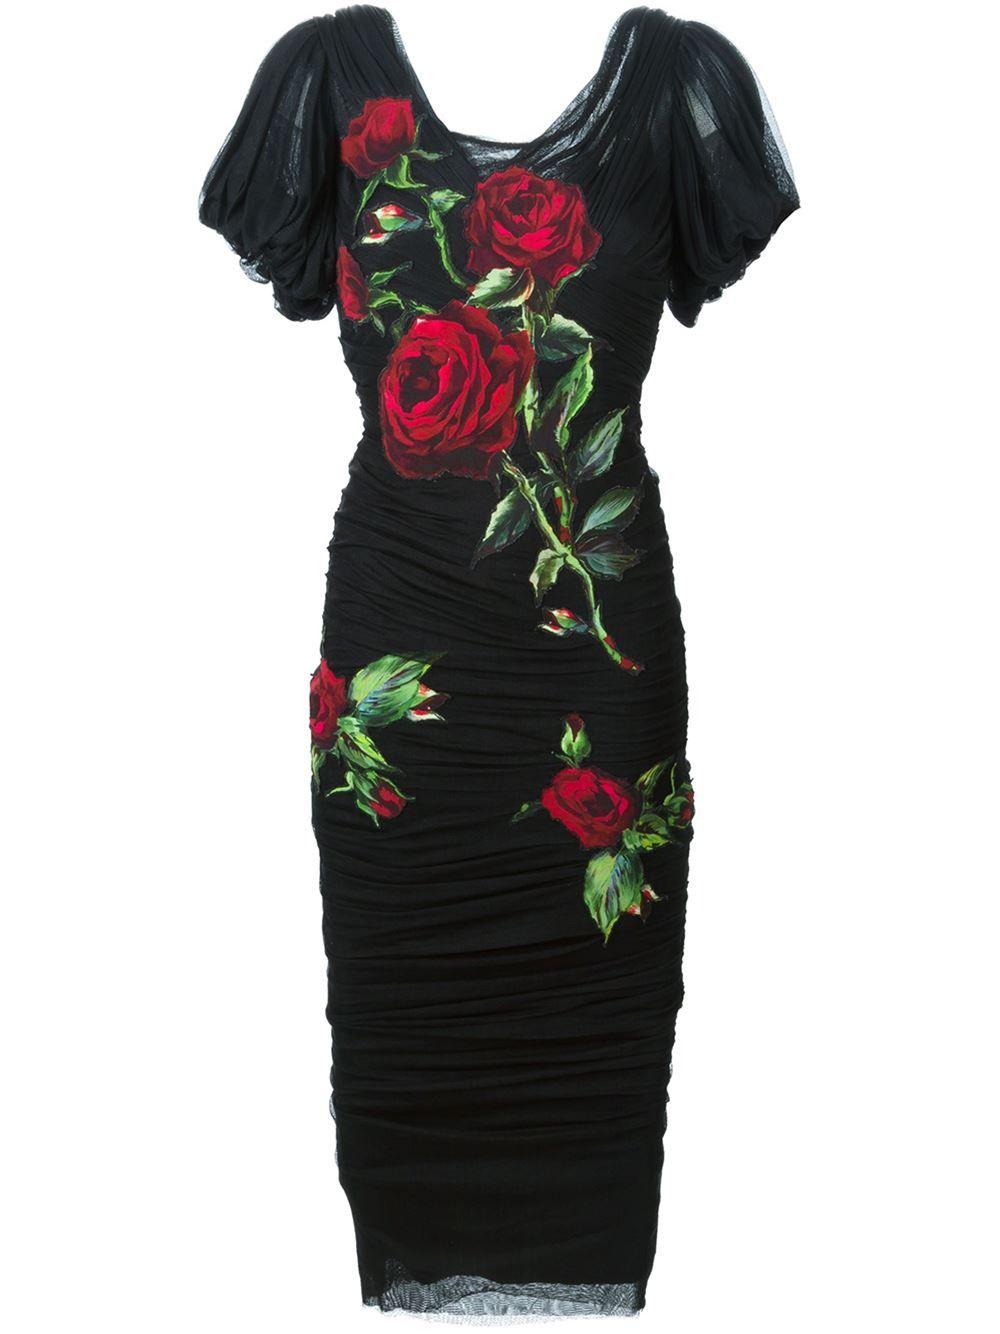 146f19d0 Dolce & Gabbana Kleid Mit Rosen-print - Profile - Farfetch.com ...